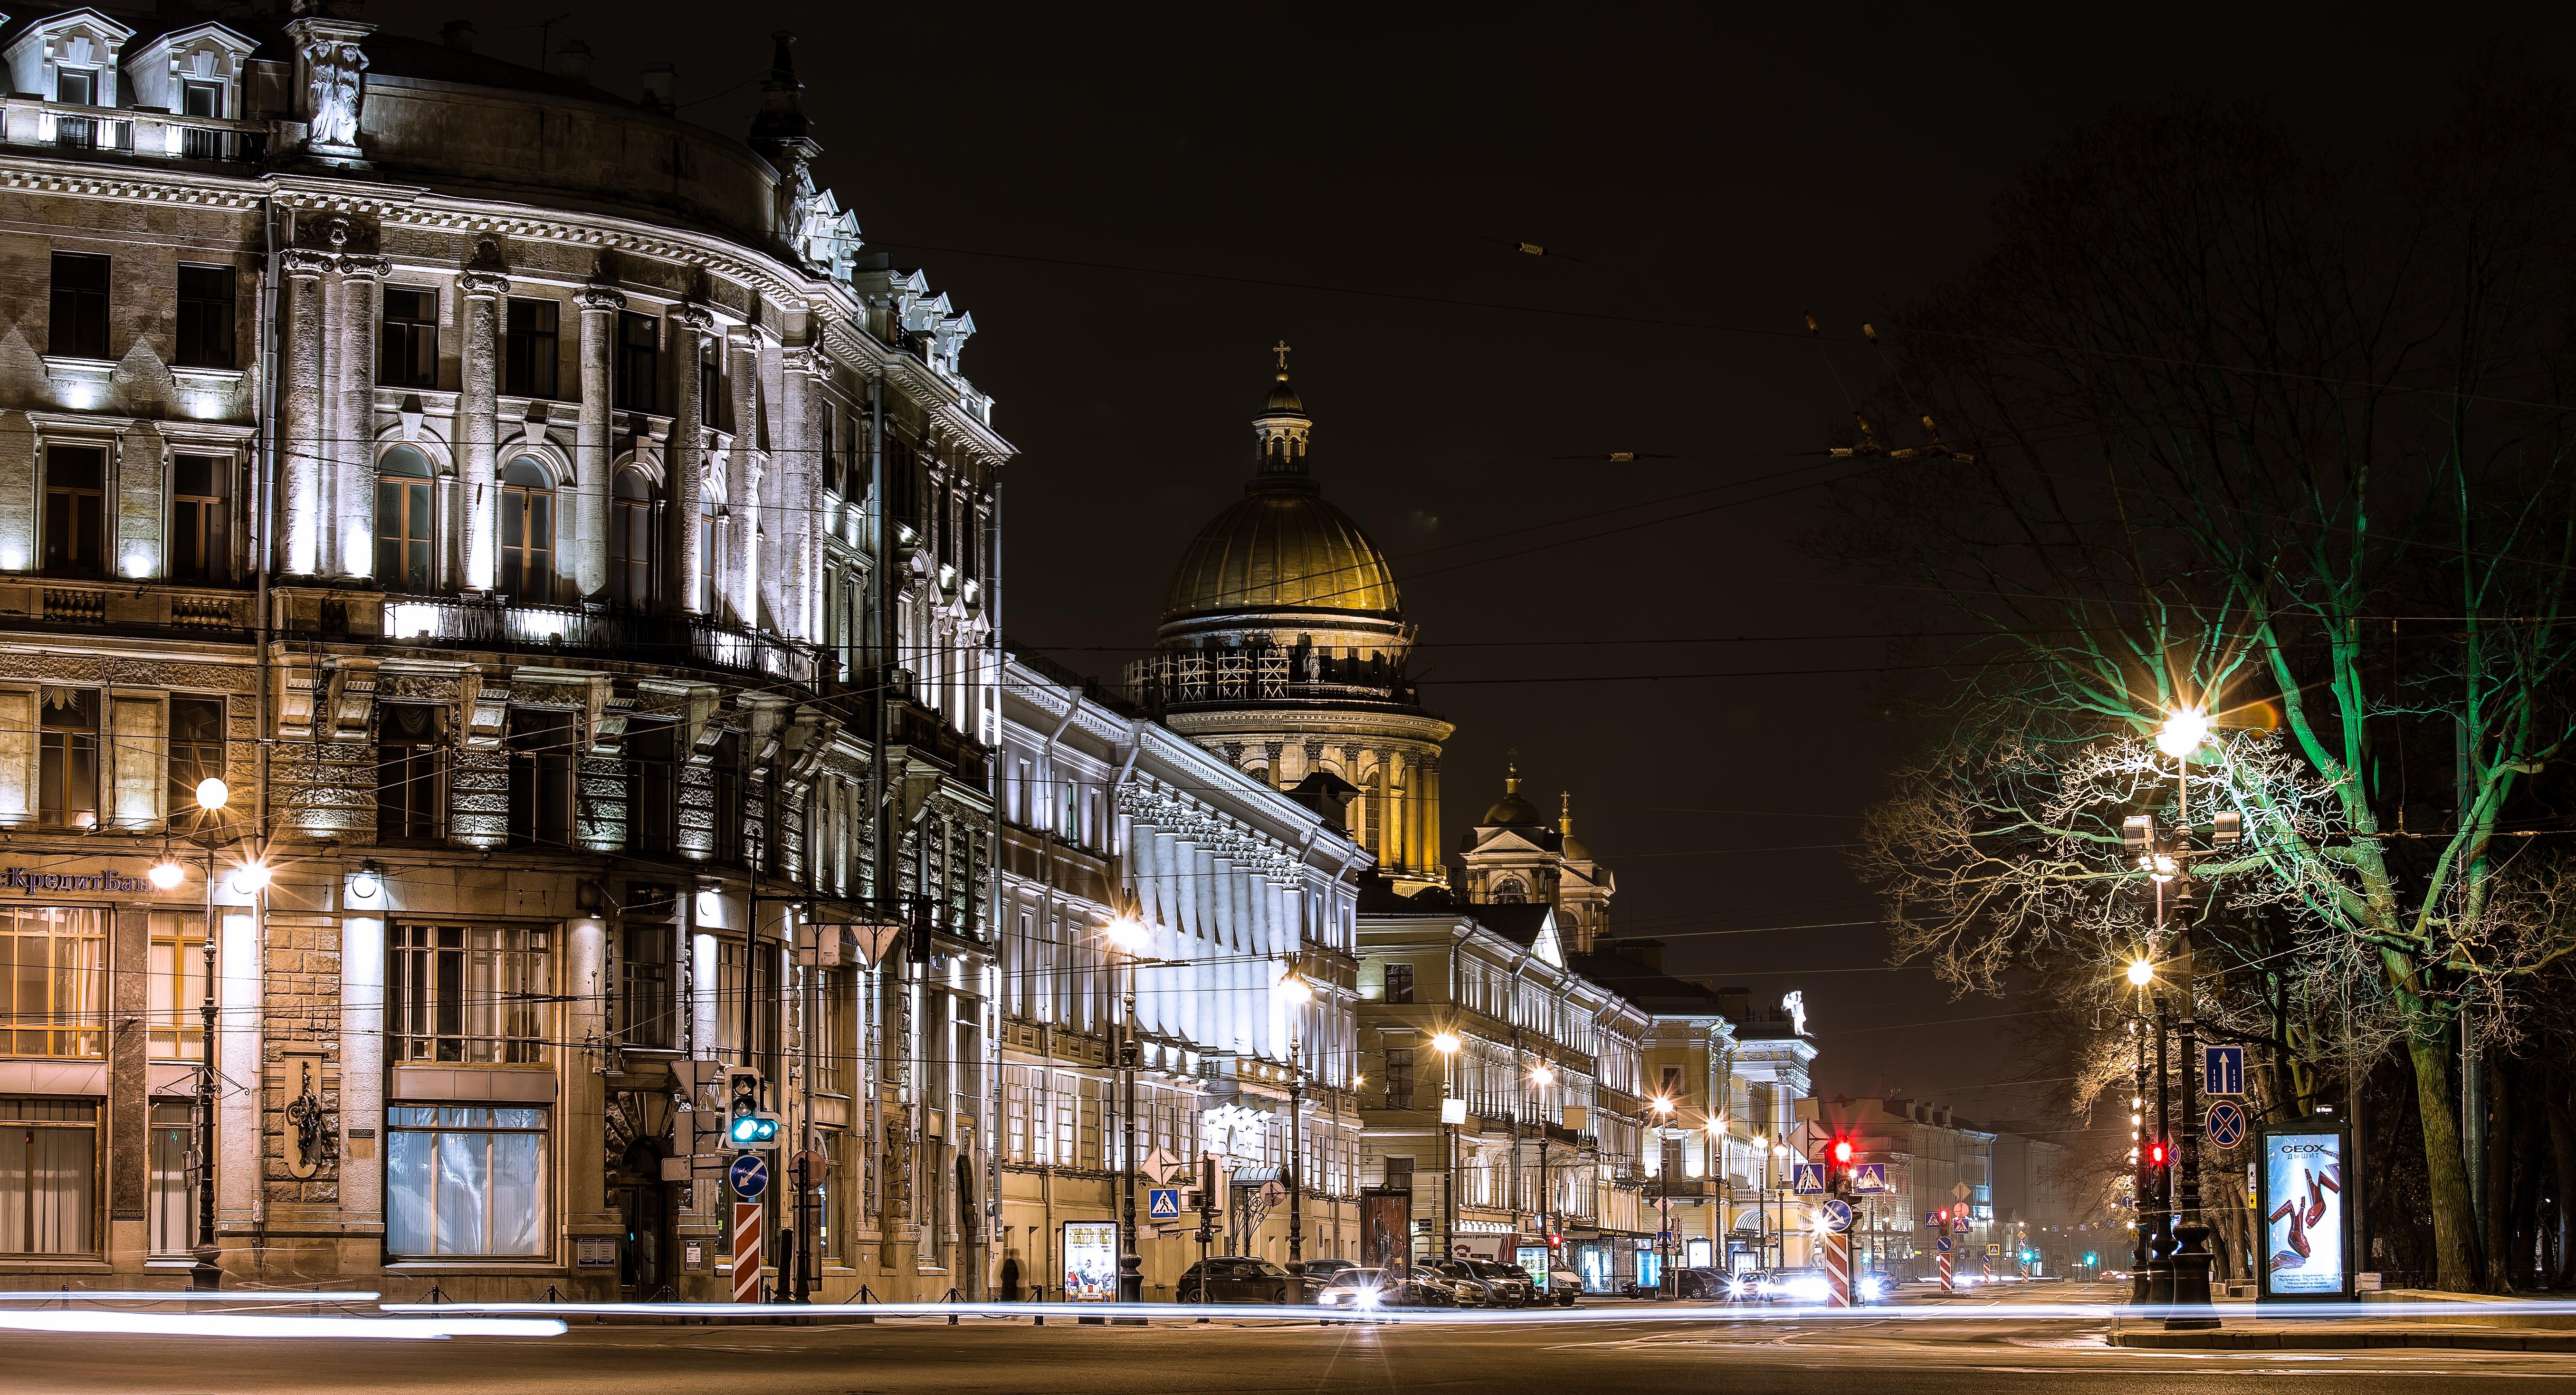 Man Made Saint Petersburg 5422x2936